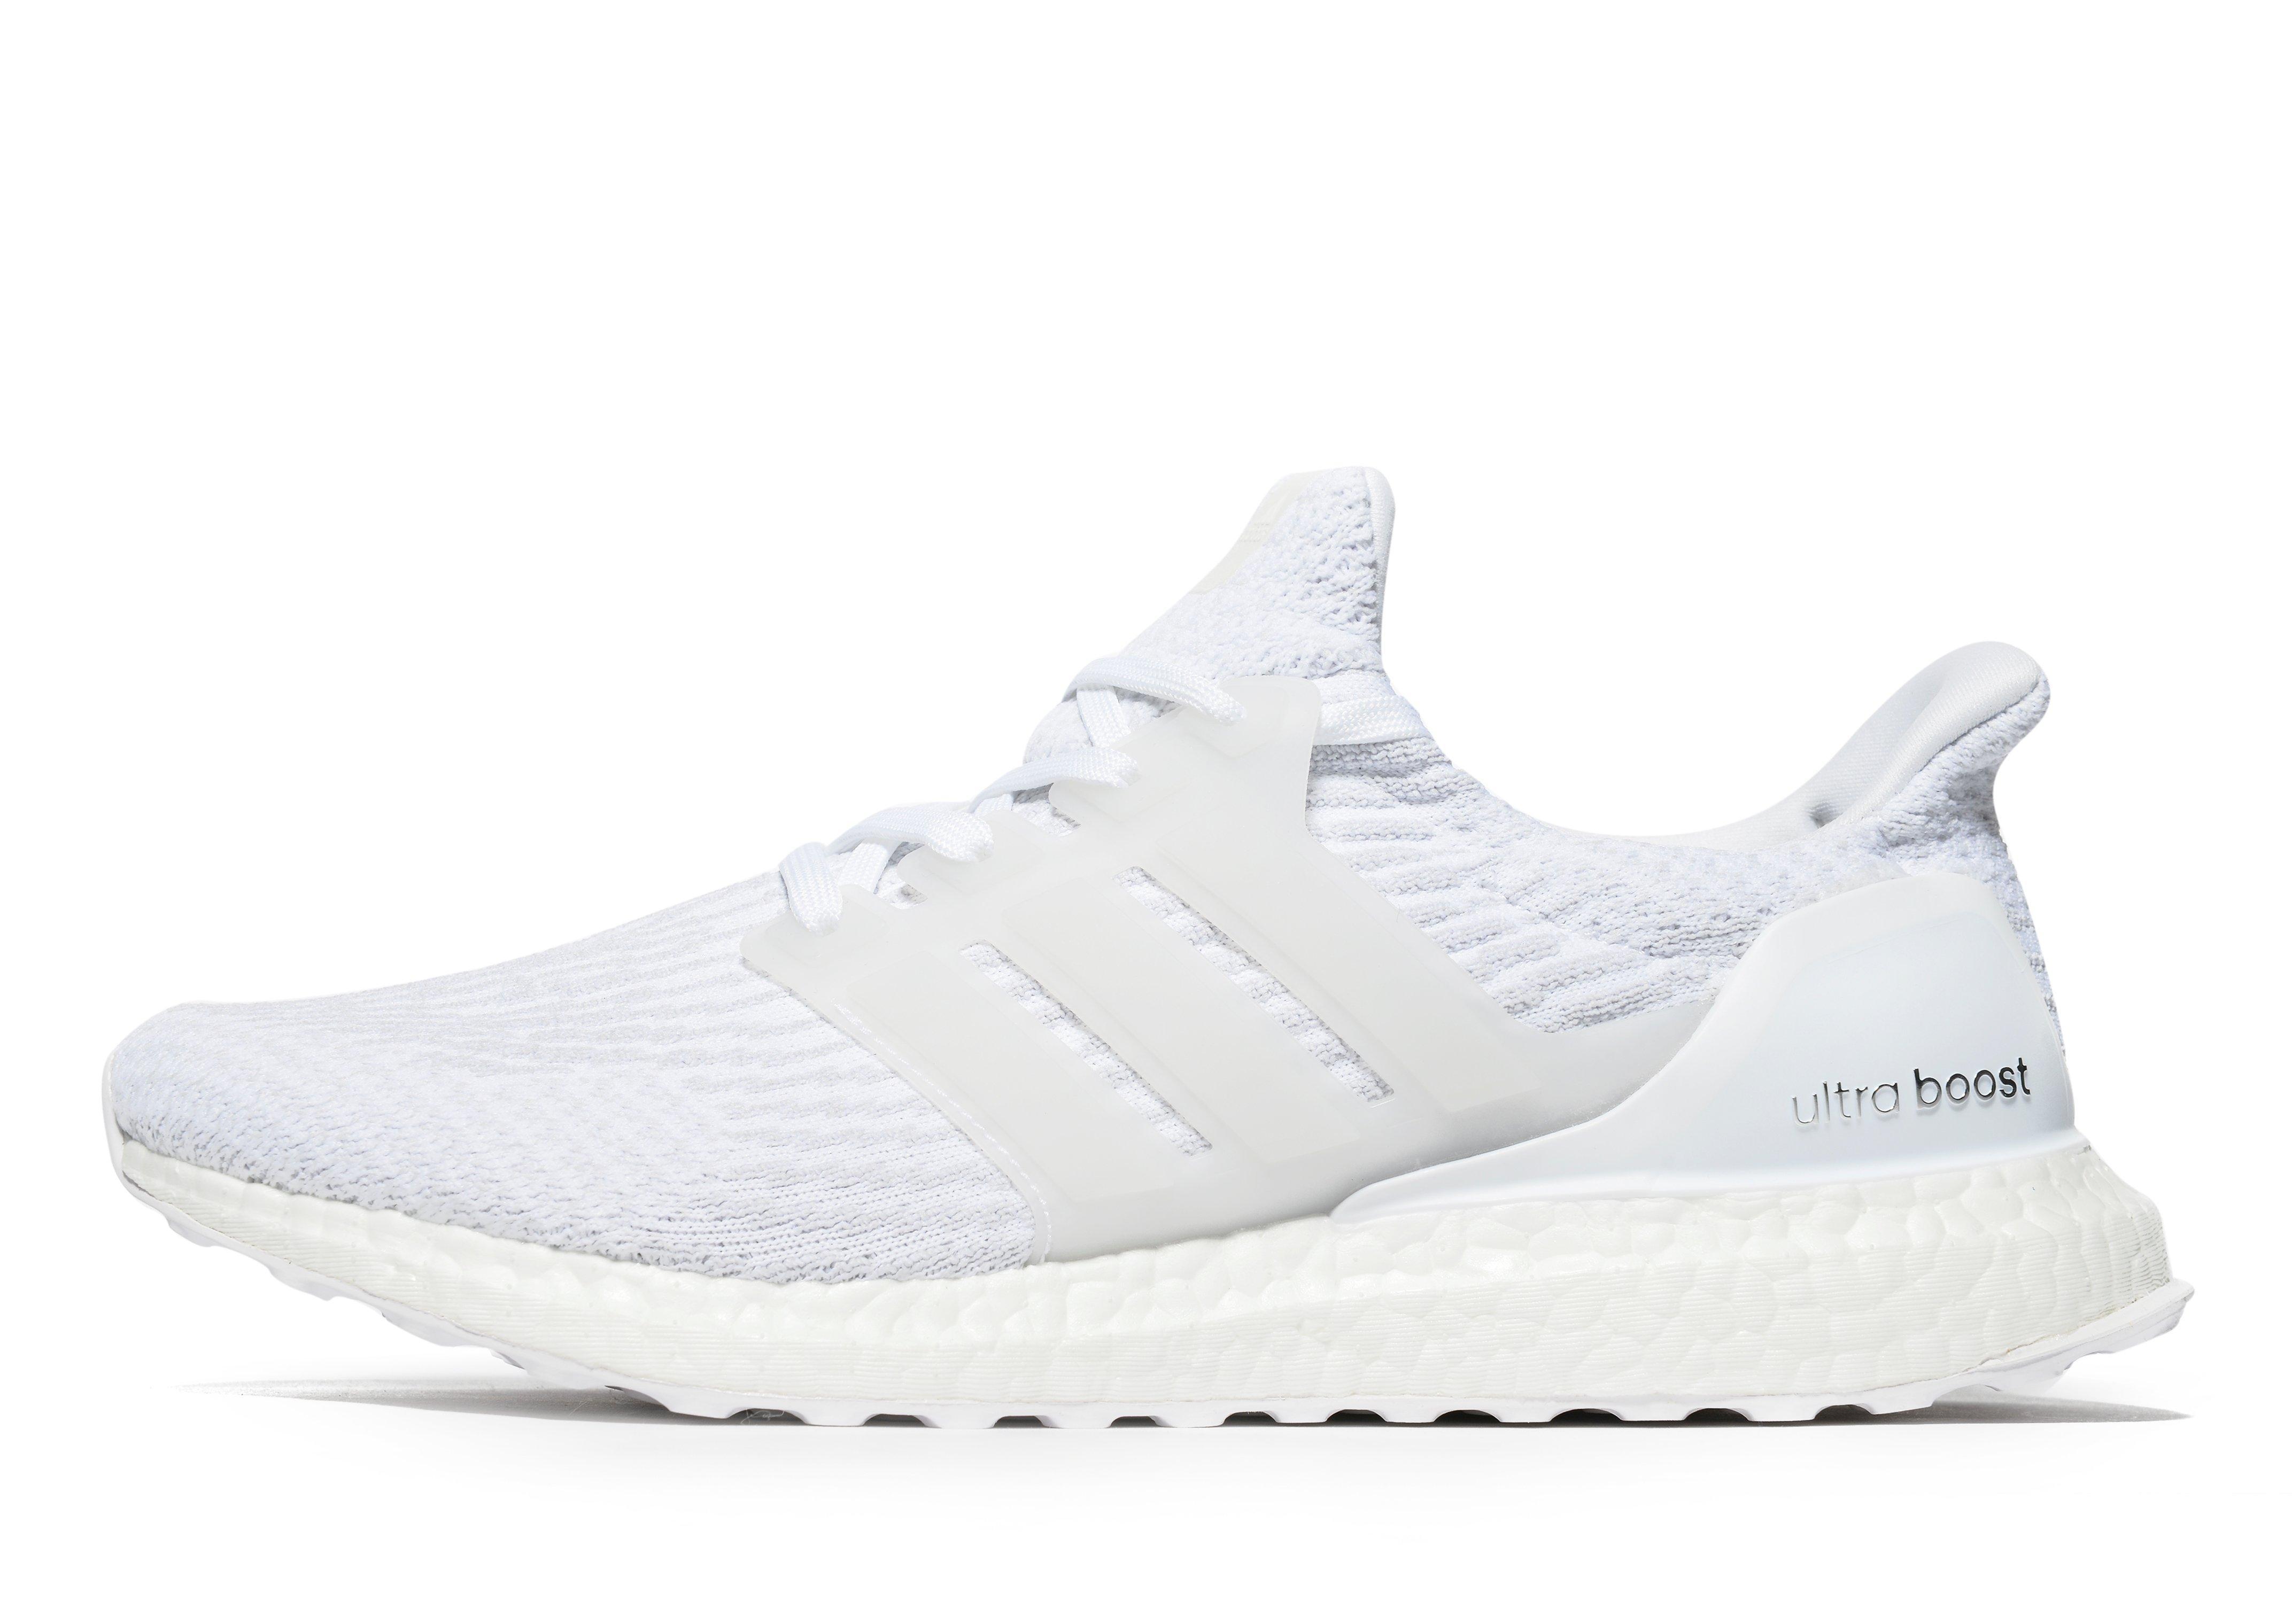 adidas ultra boost 2.0 price adida ultra boost all white